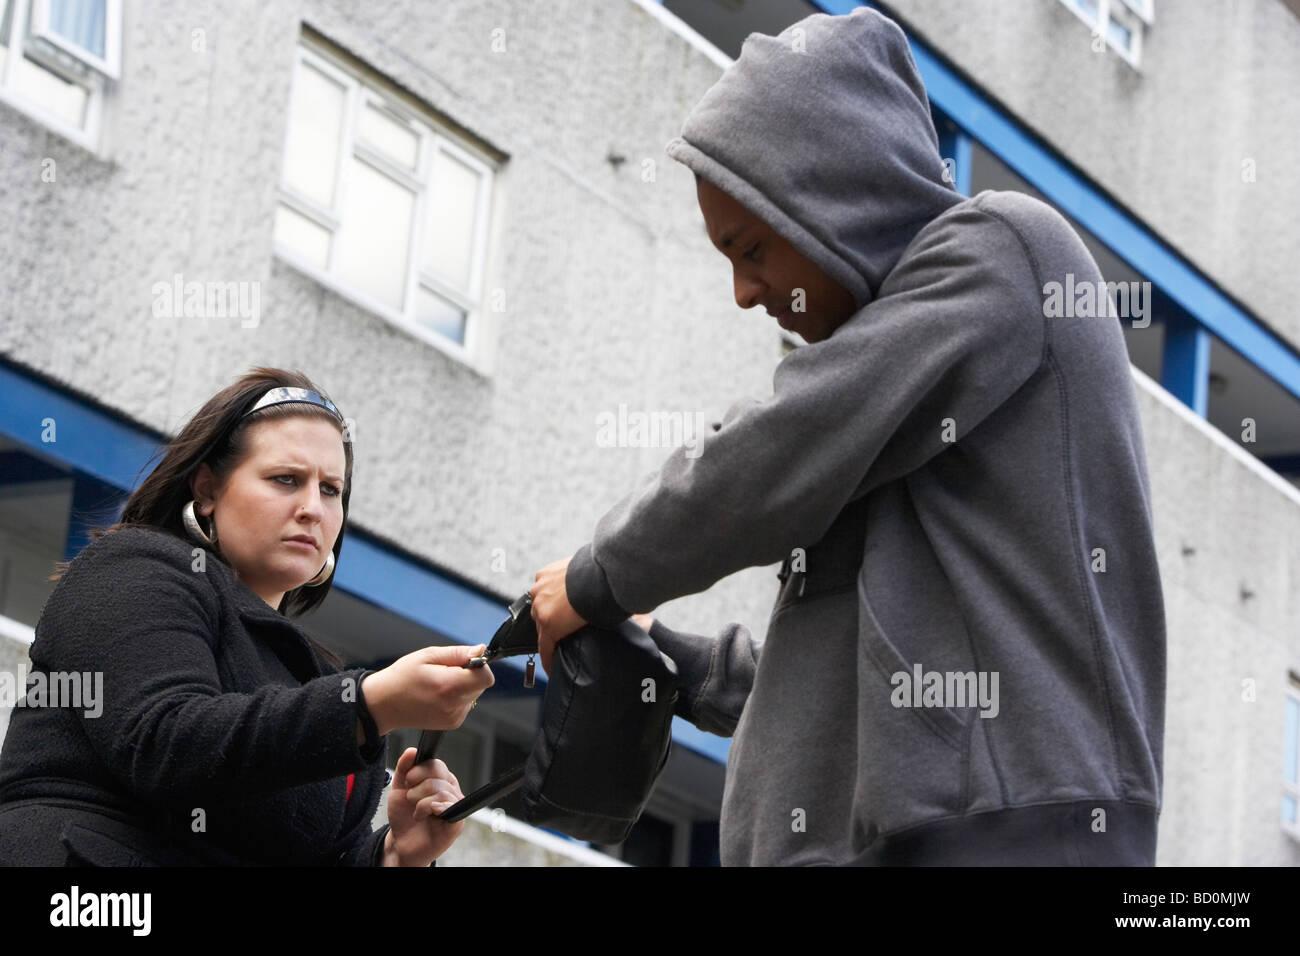 Man Mugging Woman In Street - Stock Image